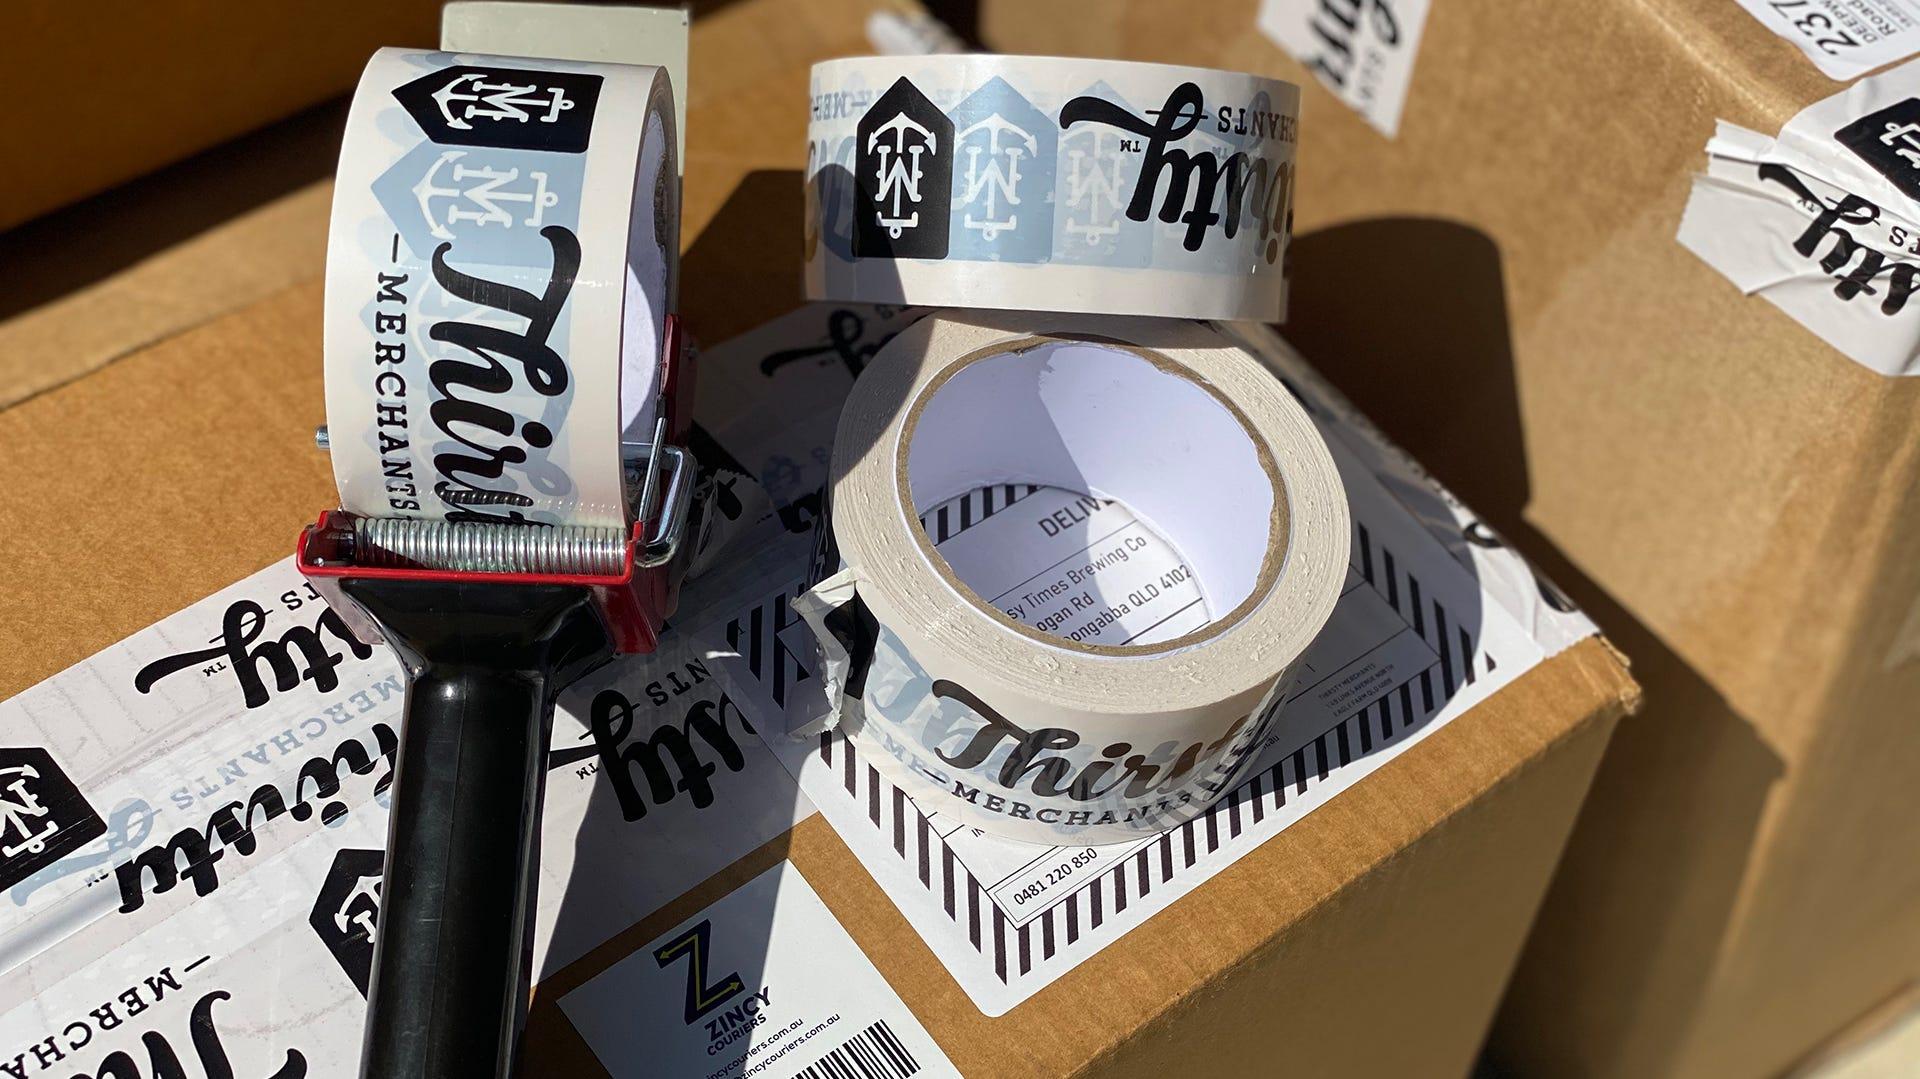 Thirsty Merchants Tape on carton